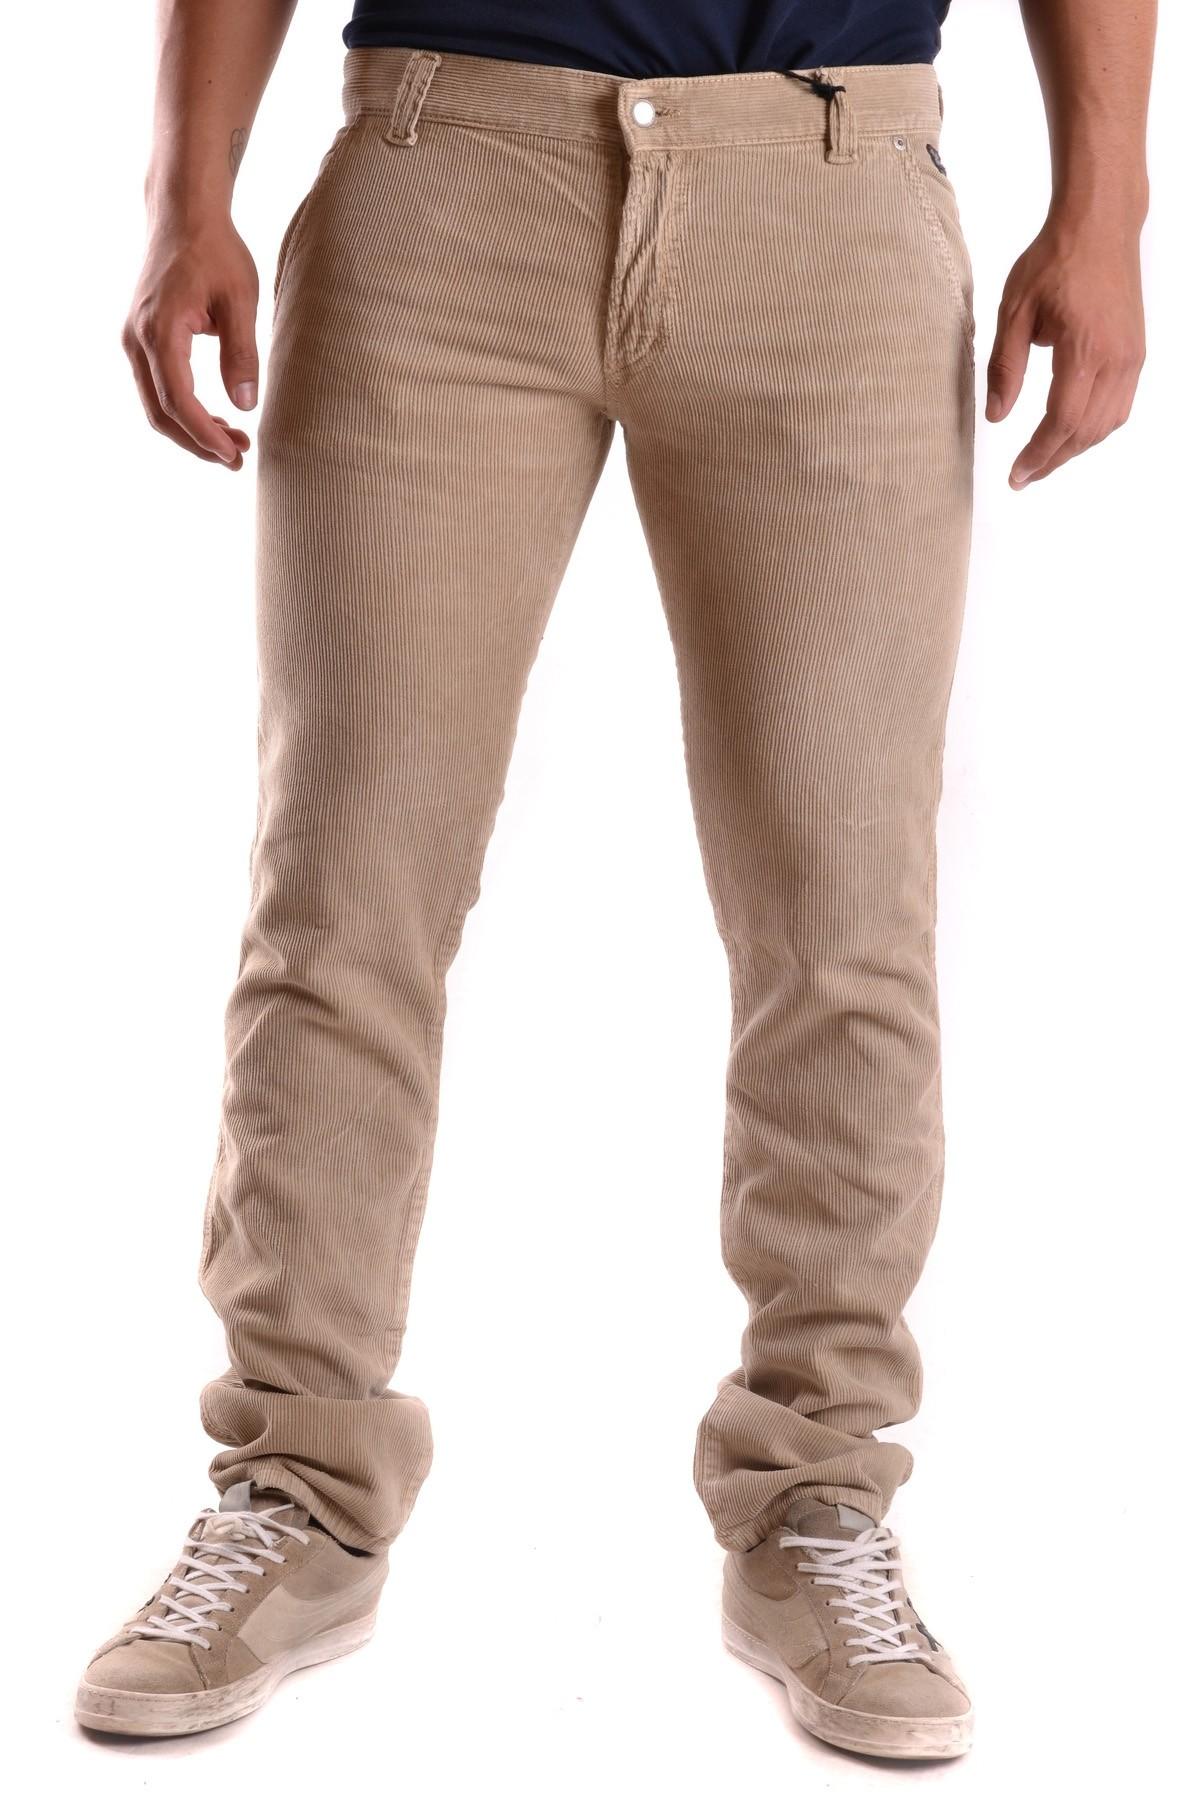 Roy Roger`s President`s Pantaloni Muži